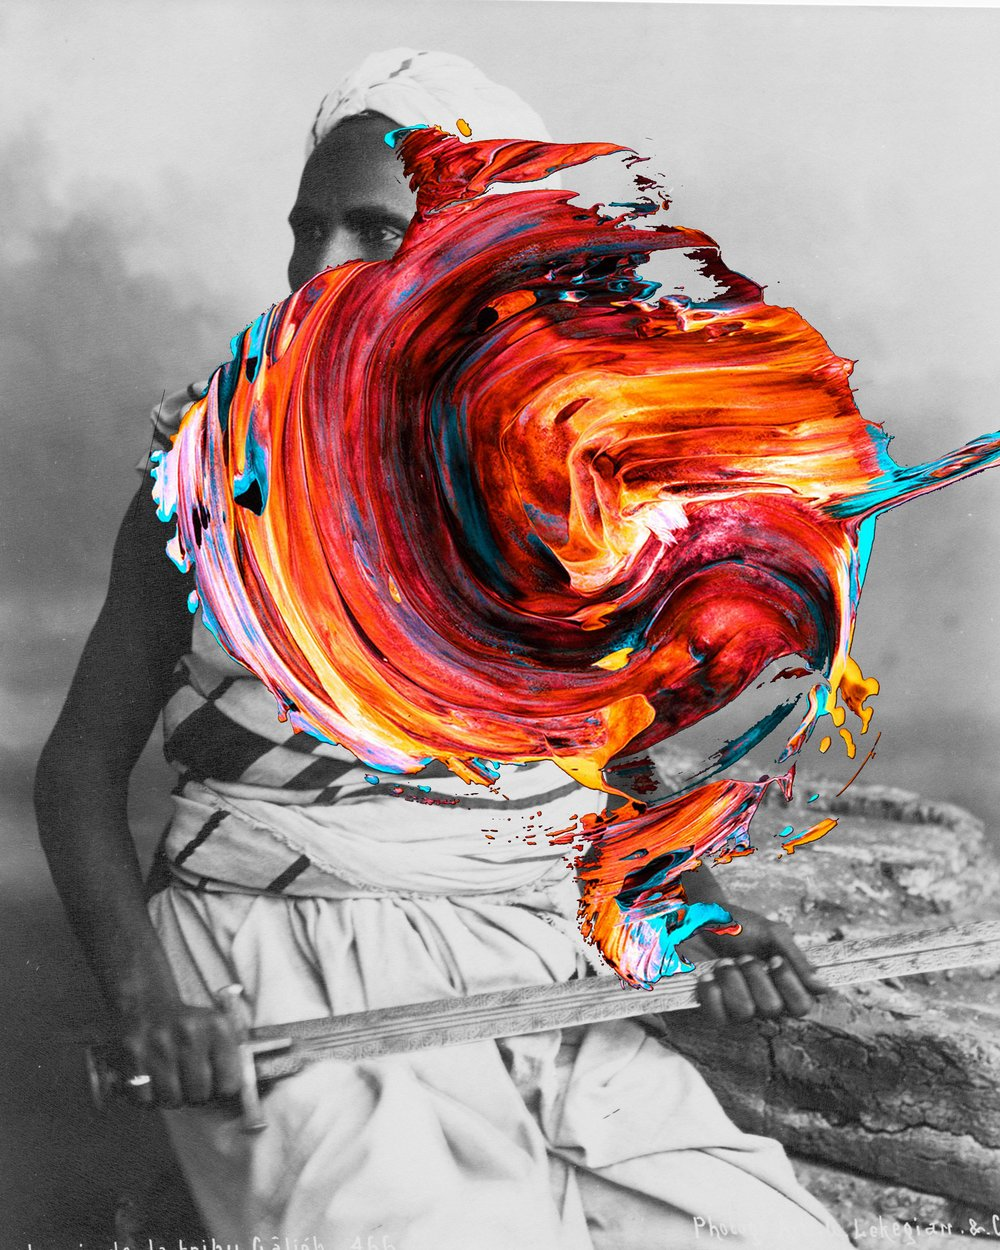 <b>Beya Khalifa</b></br><i>Scar Tissue IV</i></br>Antique photograph and digital collage</br>Limited edition of 20</br>16 x 12 in